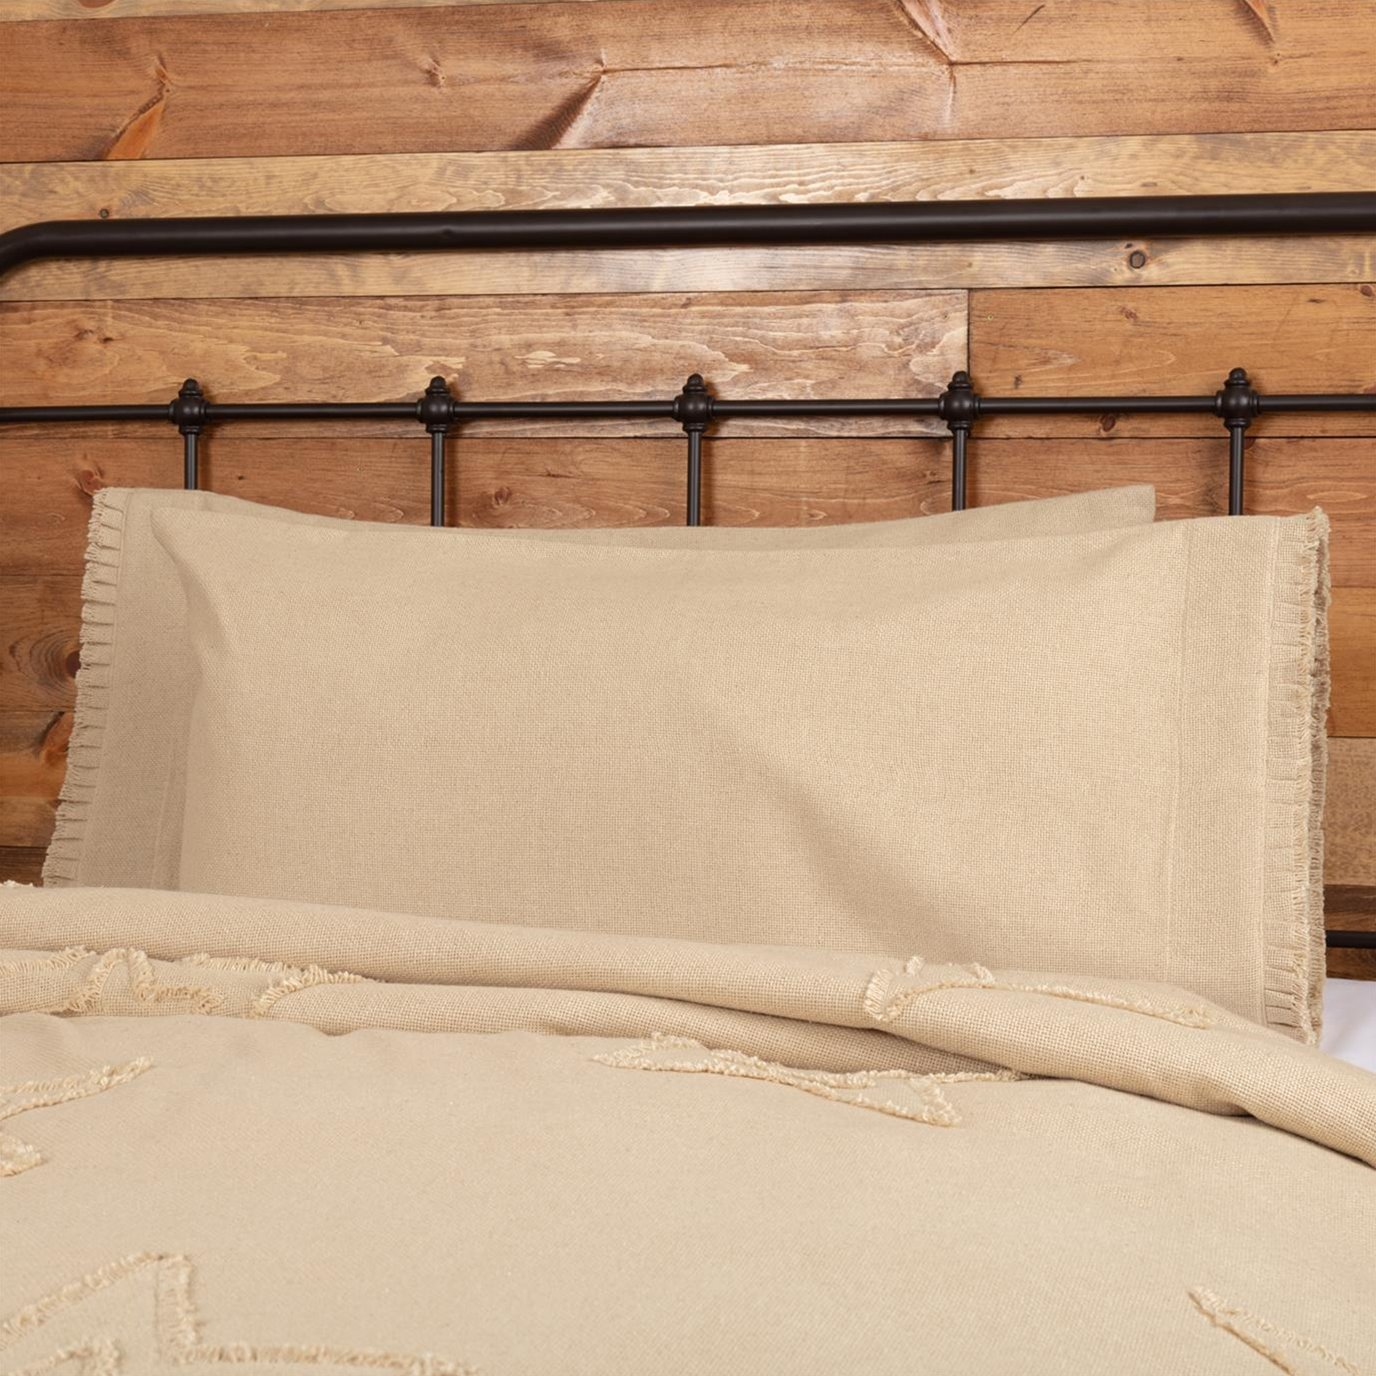 Burlap Vintage King Pillow Case w/ Fringed Ruffle Set of 2 21x40